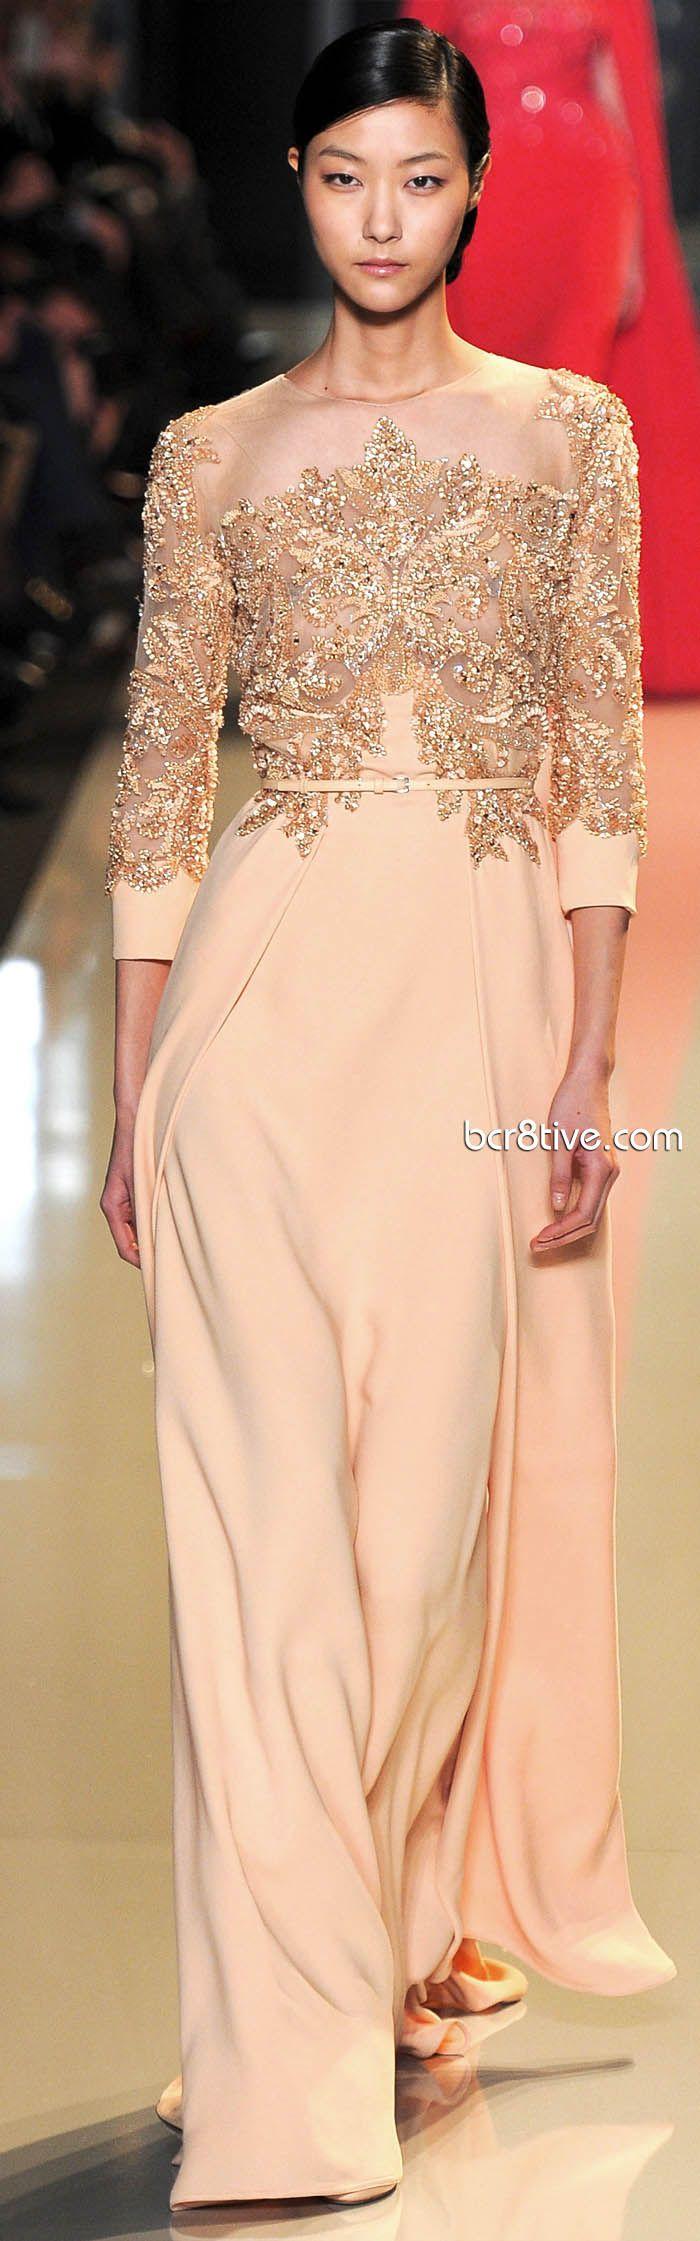 Elie Saab Spring Summer 2013 Haute Couture